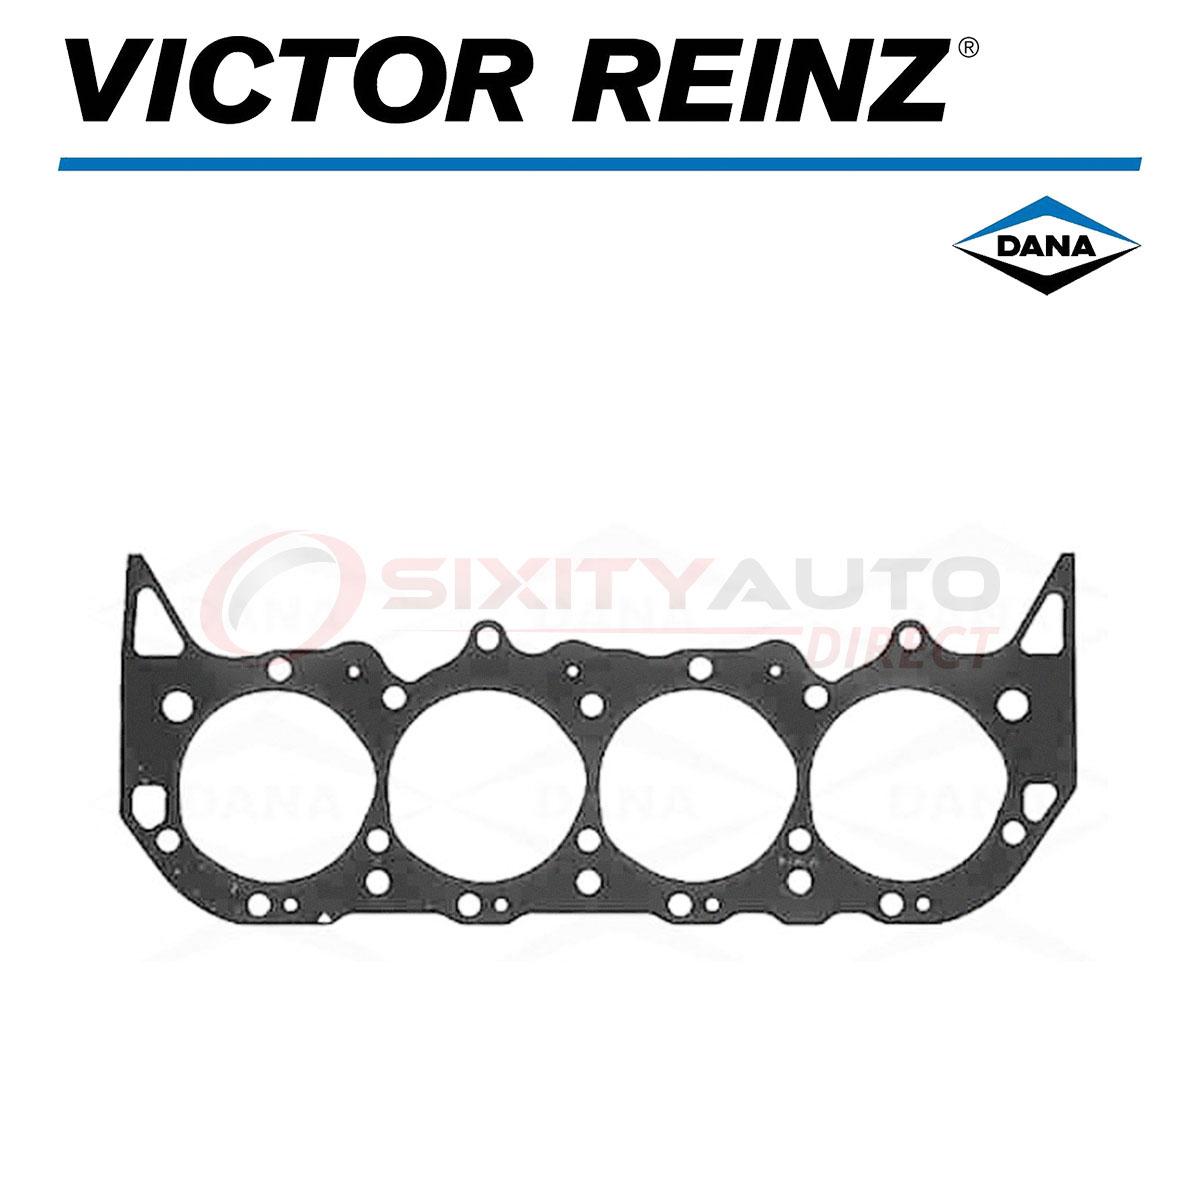 Victor Reinz Cylinder Head Gasket For Chevrolet C10 7